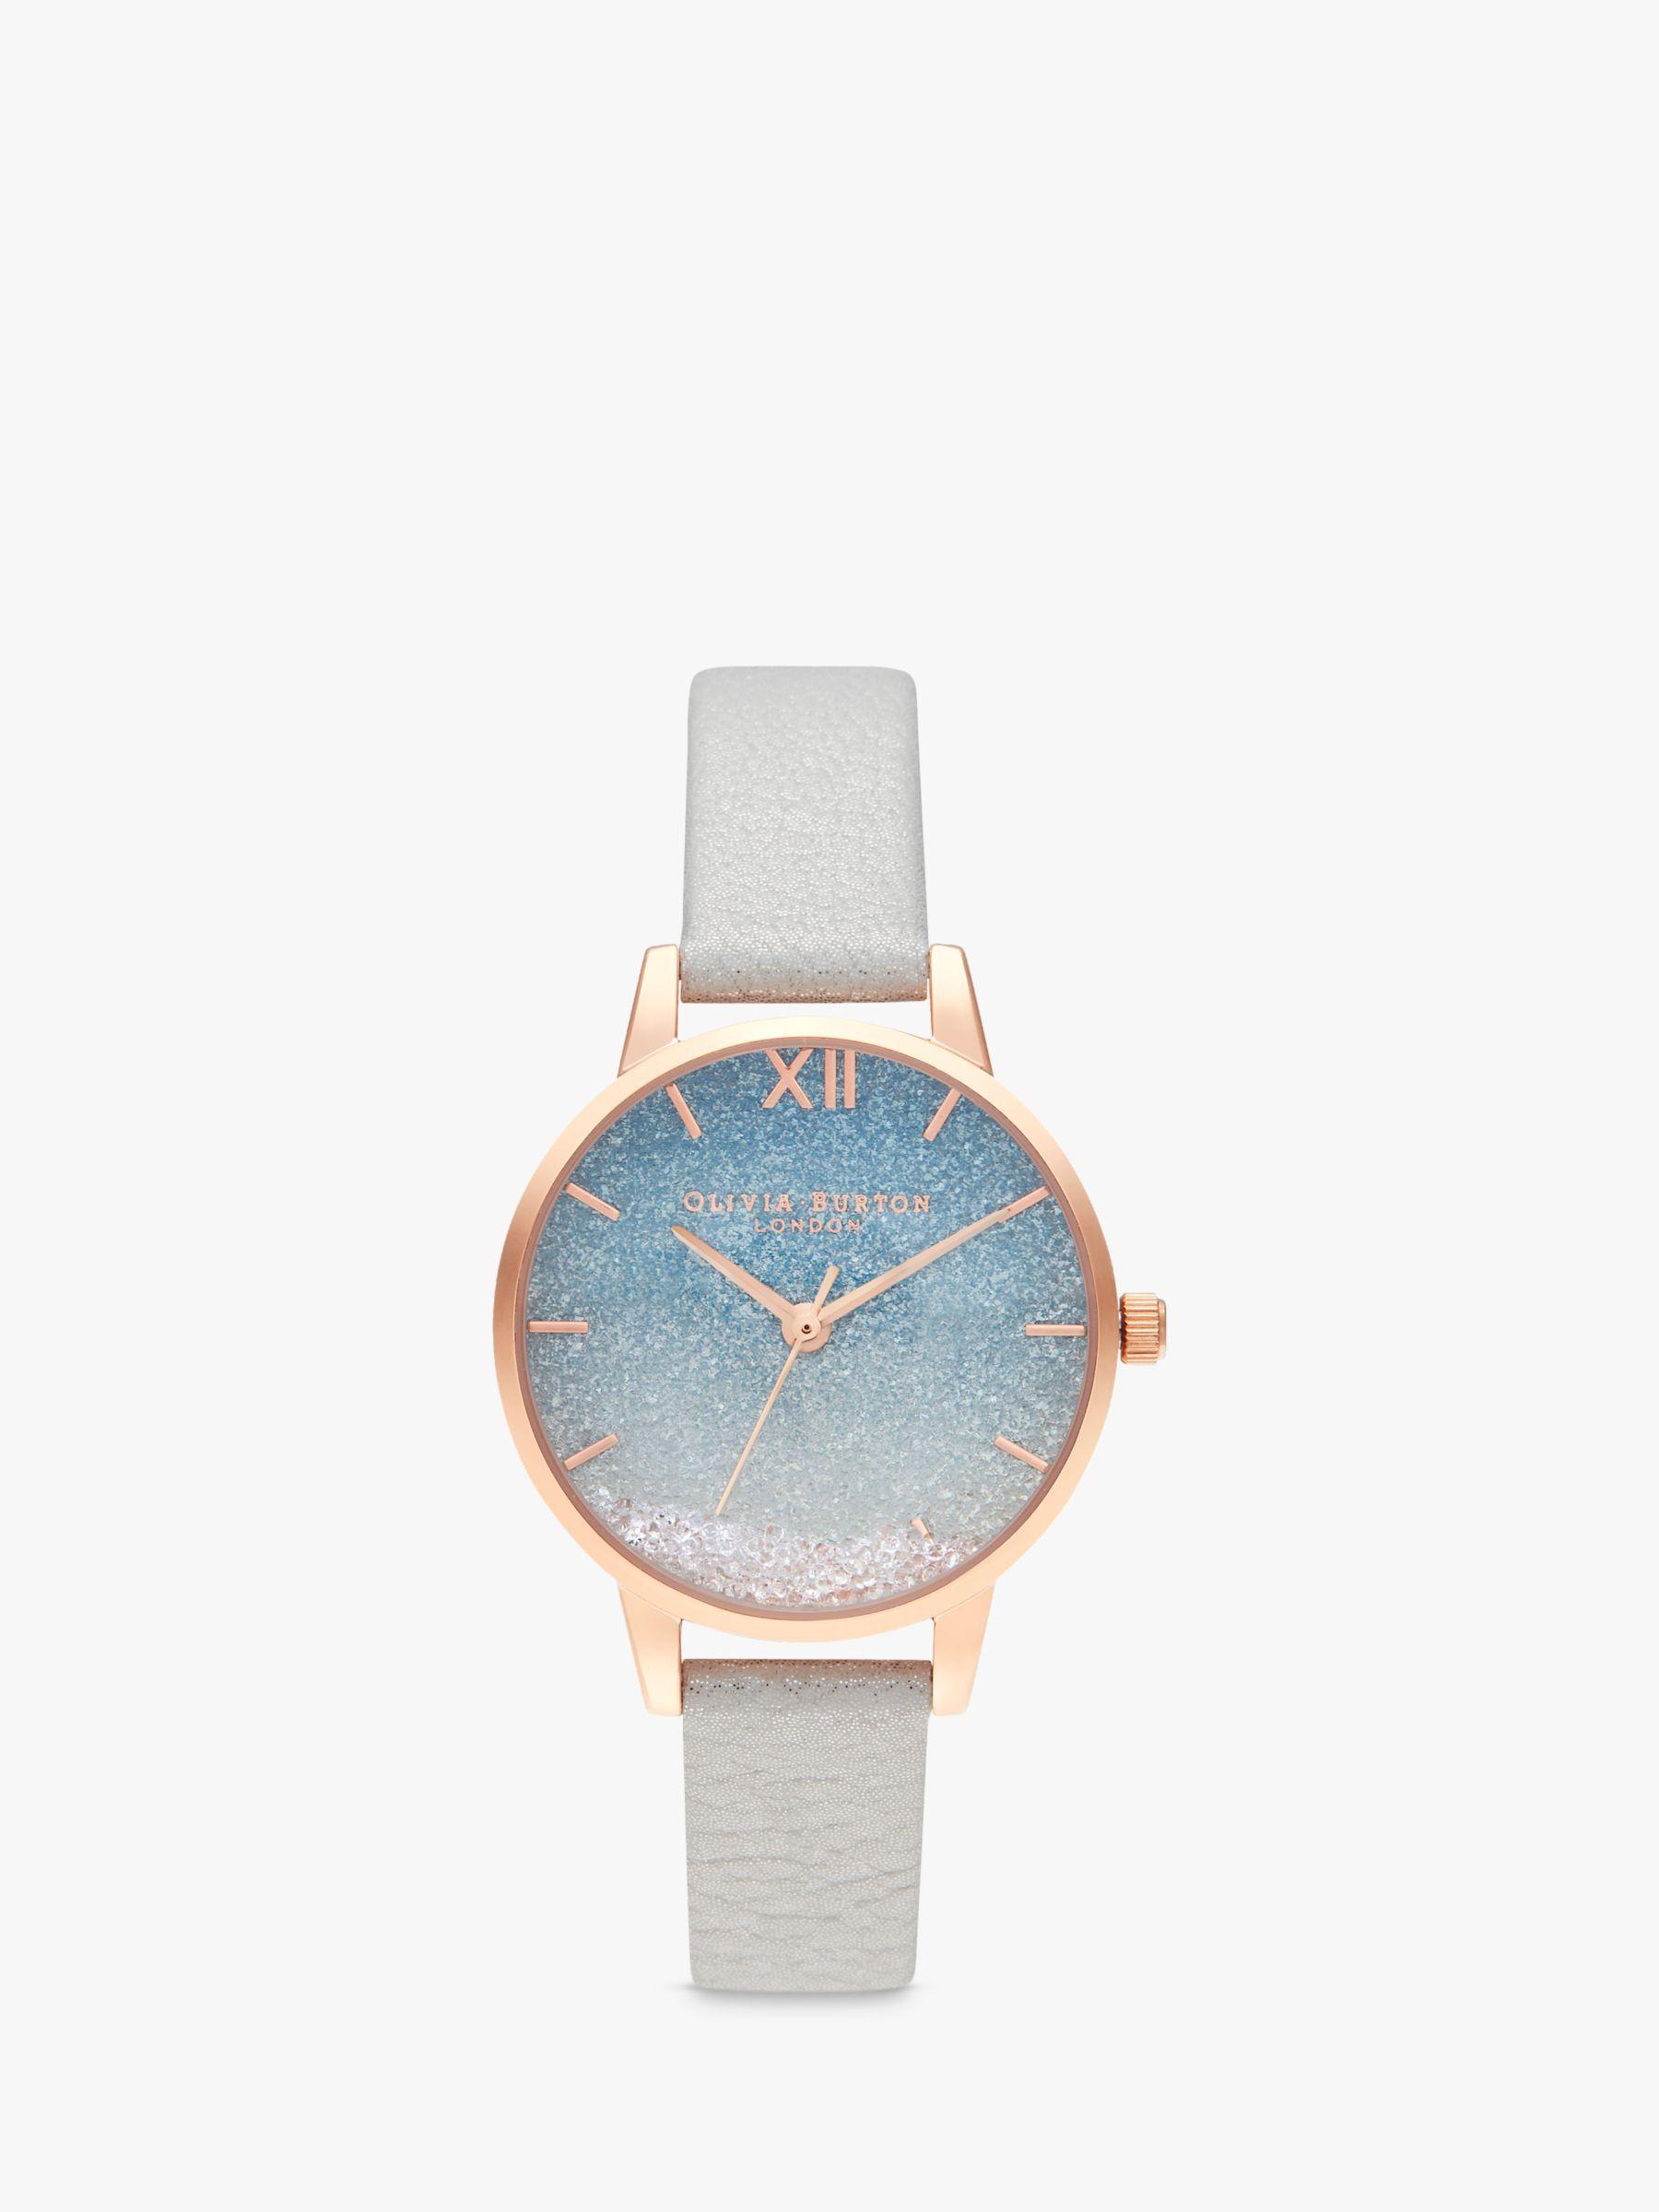 Olivia Burton Olivia Burton OB16US26 Women's Under The Sea Faux Leather Strap Watch, Grey/Glitter Blue